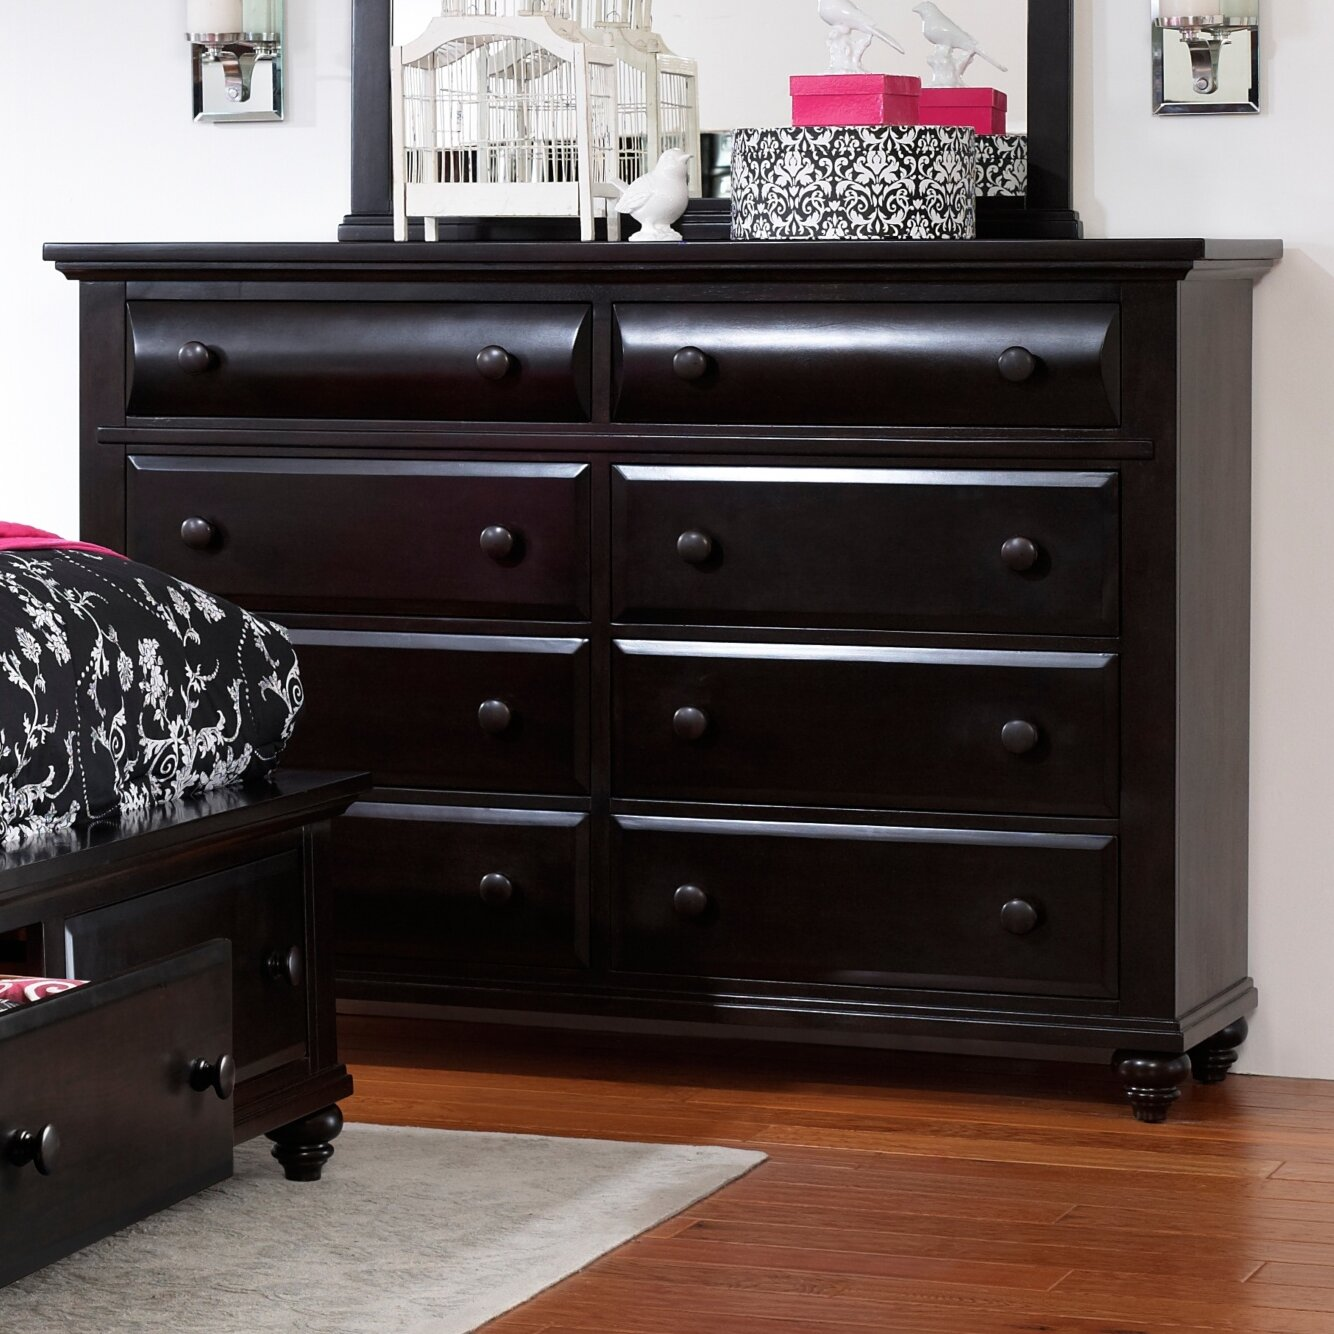 Broyhill Farnsworth 8 Drawer Dresser Reviews Wayfair. 8 Drawer Black Dresser   Trend Dressers Designs